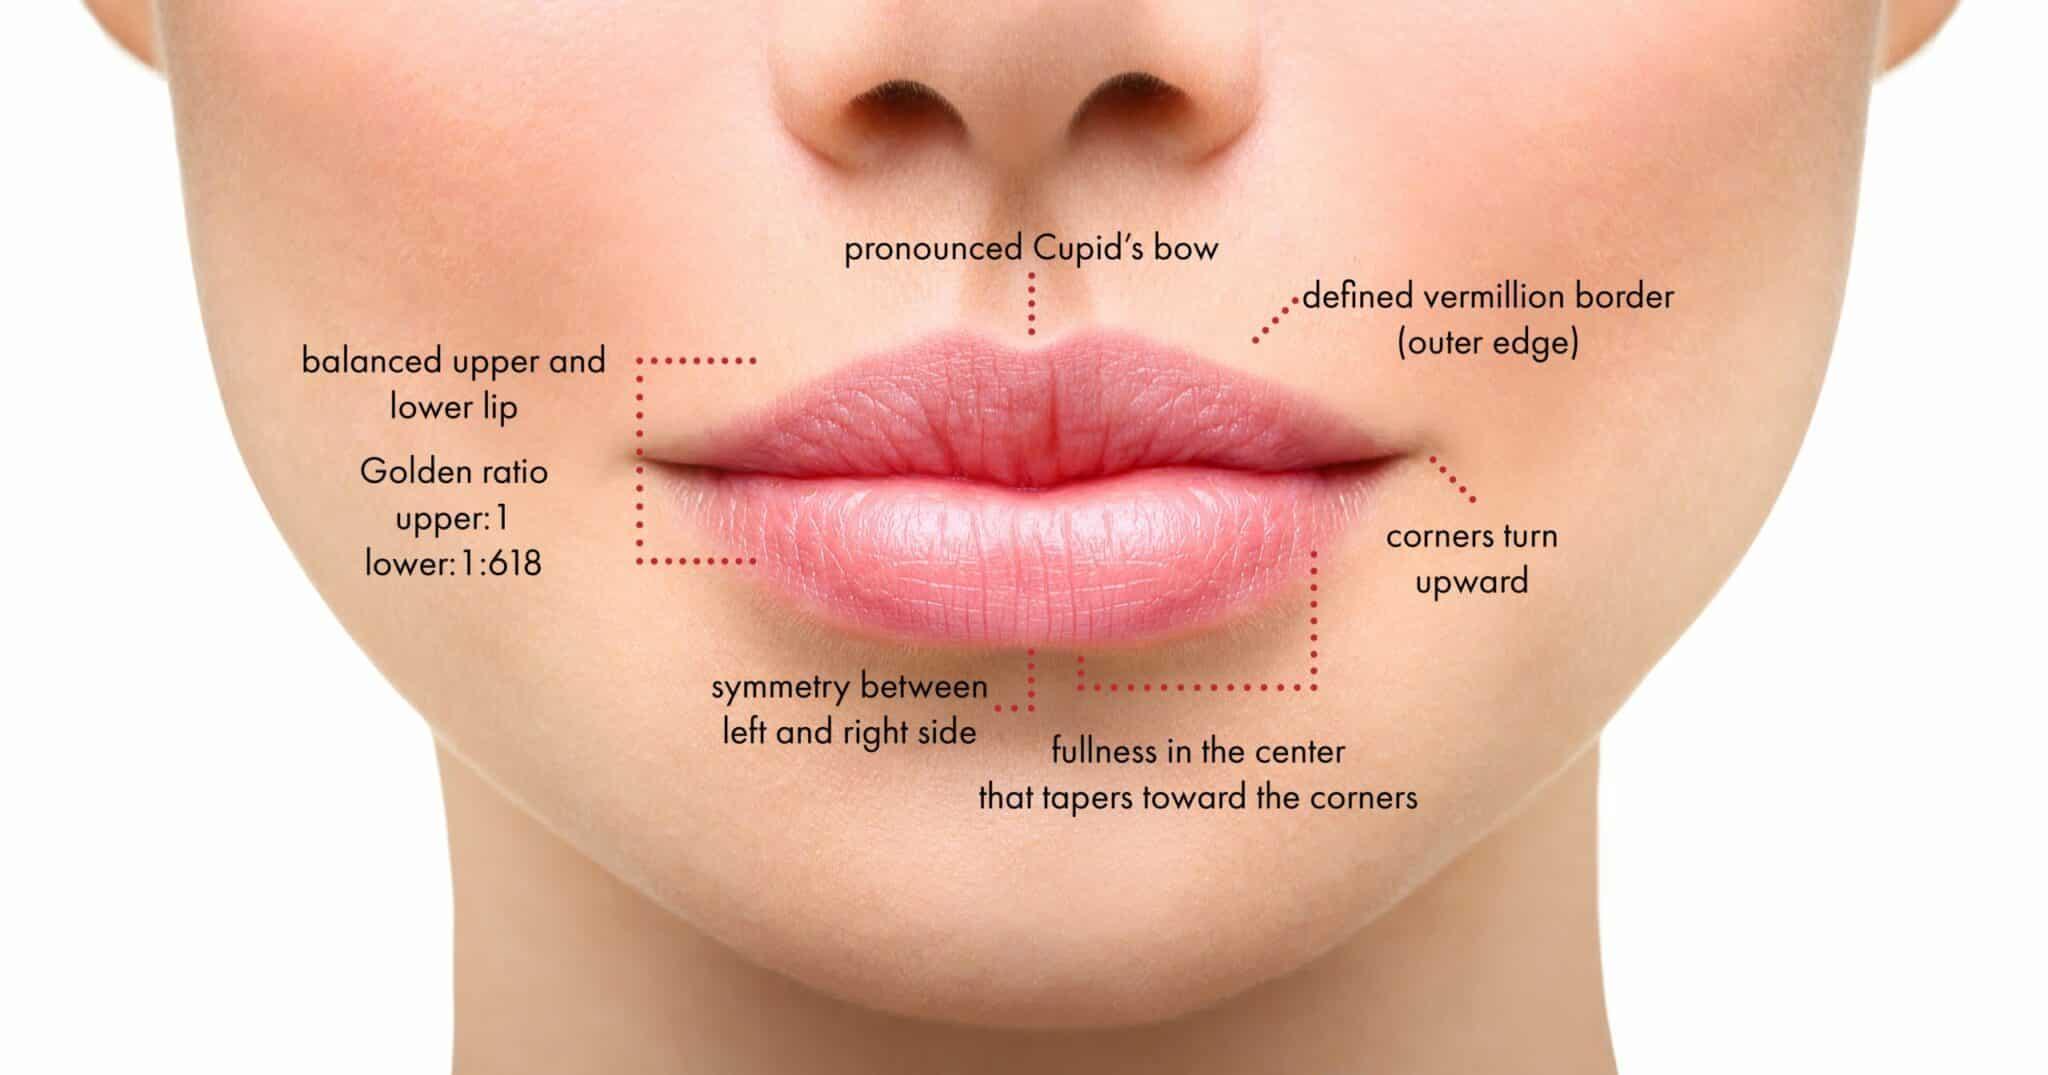 juvederm facial filler injectable diagram in new york